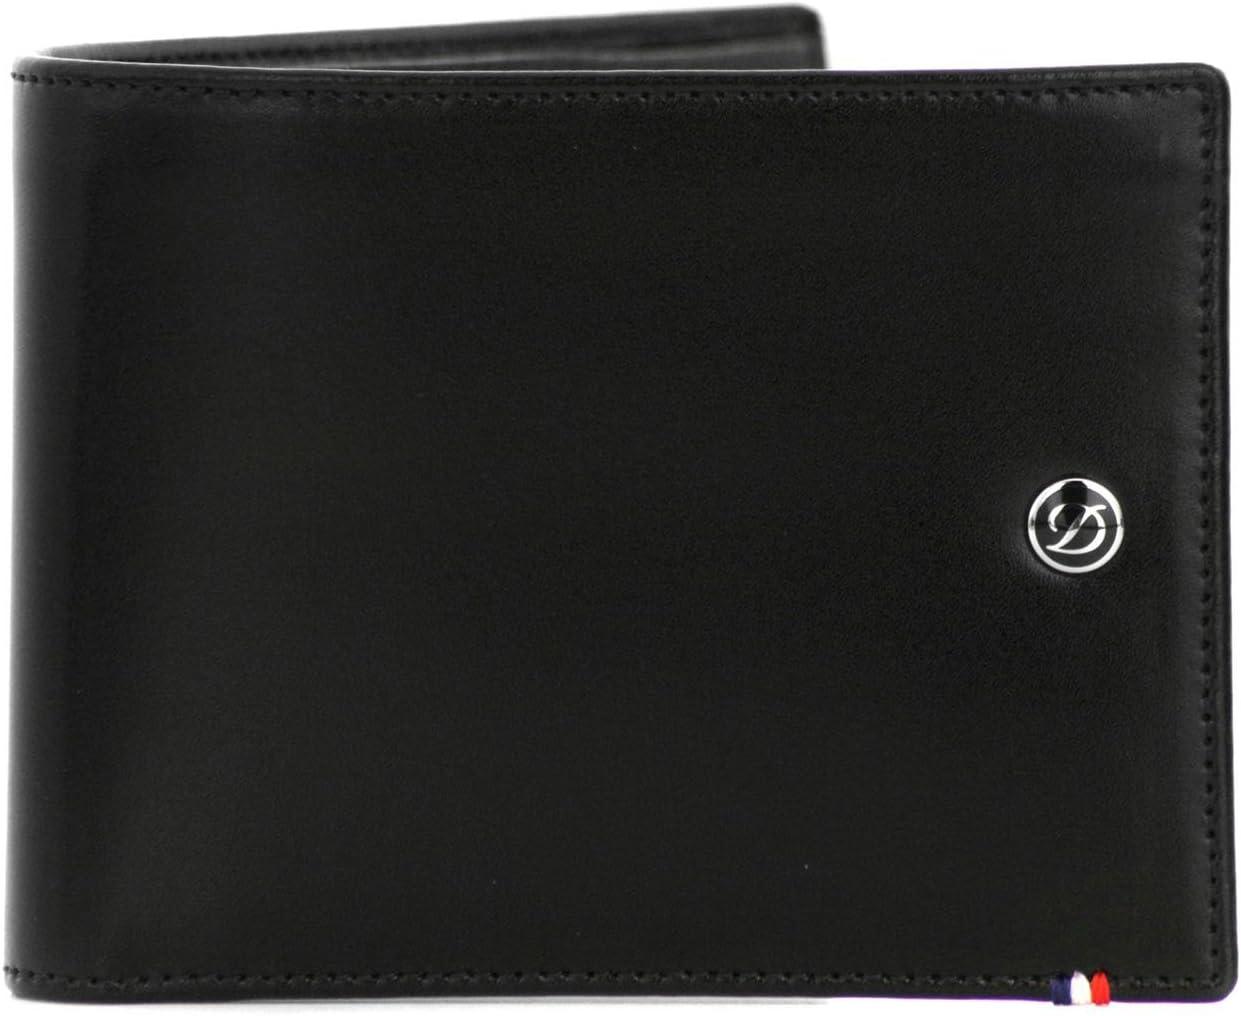 S.T. Dupont Line D Wallet, Black, Leather, 8 Cards, 180003